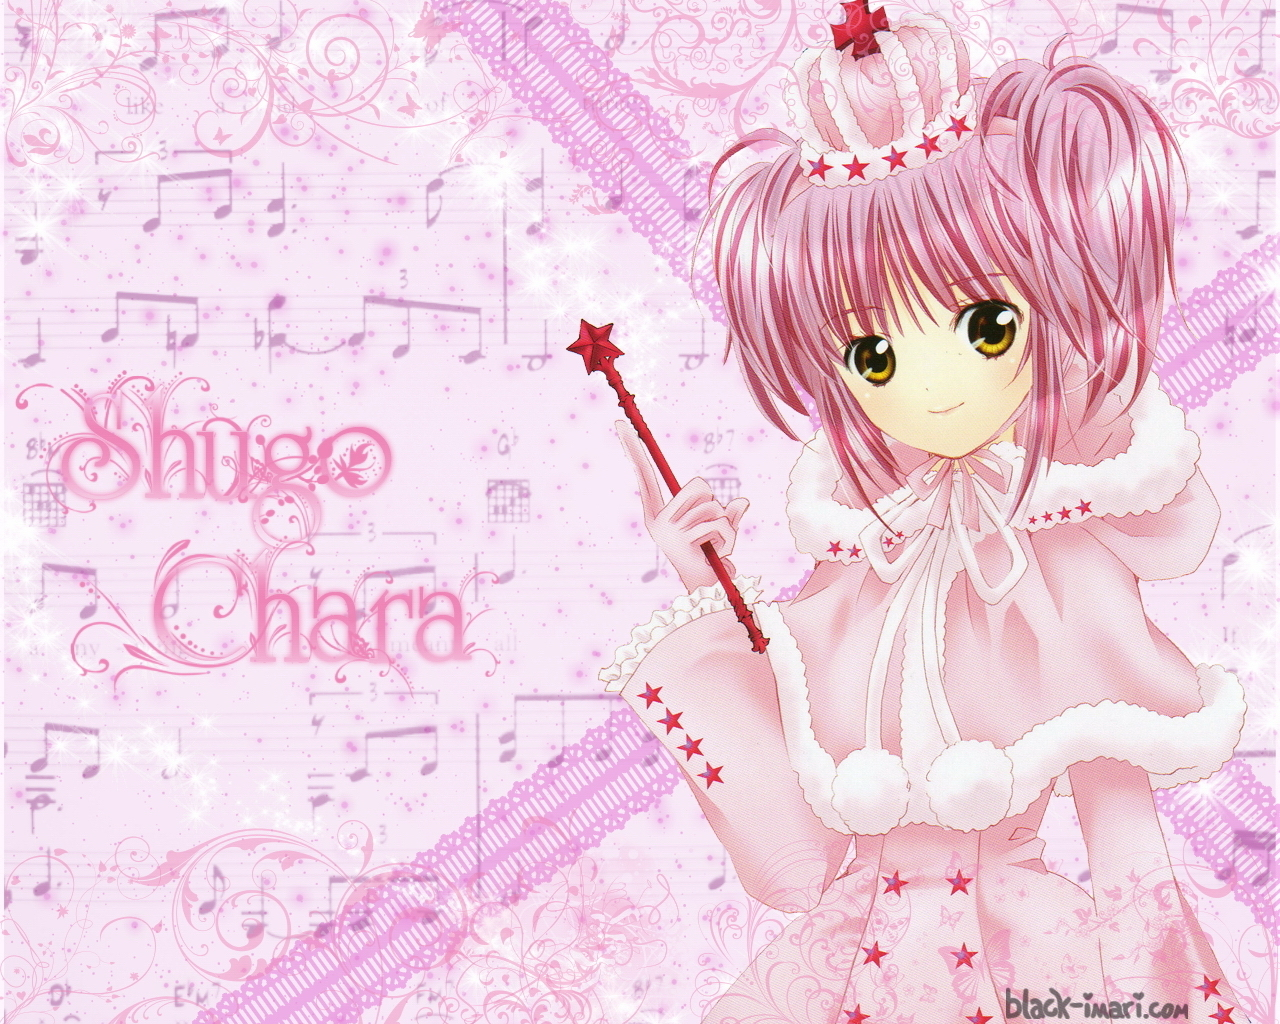 http://4.bp.blogspot.com/_yceRPUAEPKs/TTtO6jc-ClI/AAAAAAAAB0E/5DIIDd79MMc/s1600/shugo_chara_03.jpg